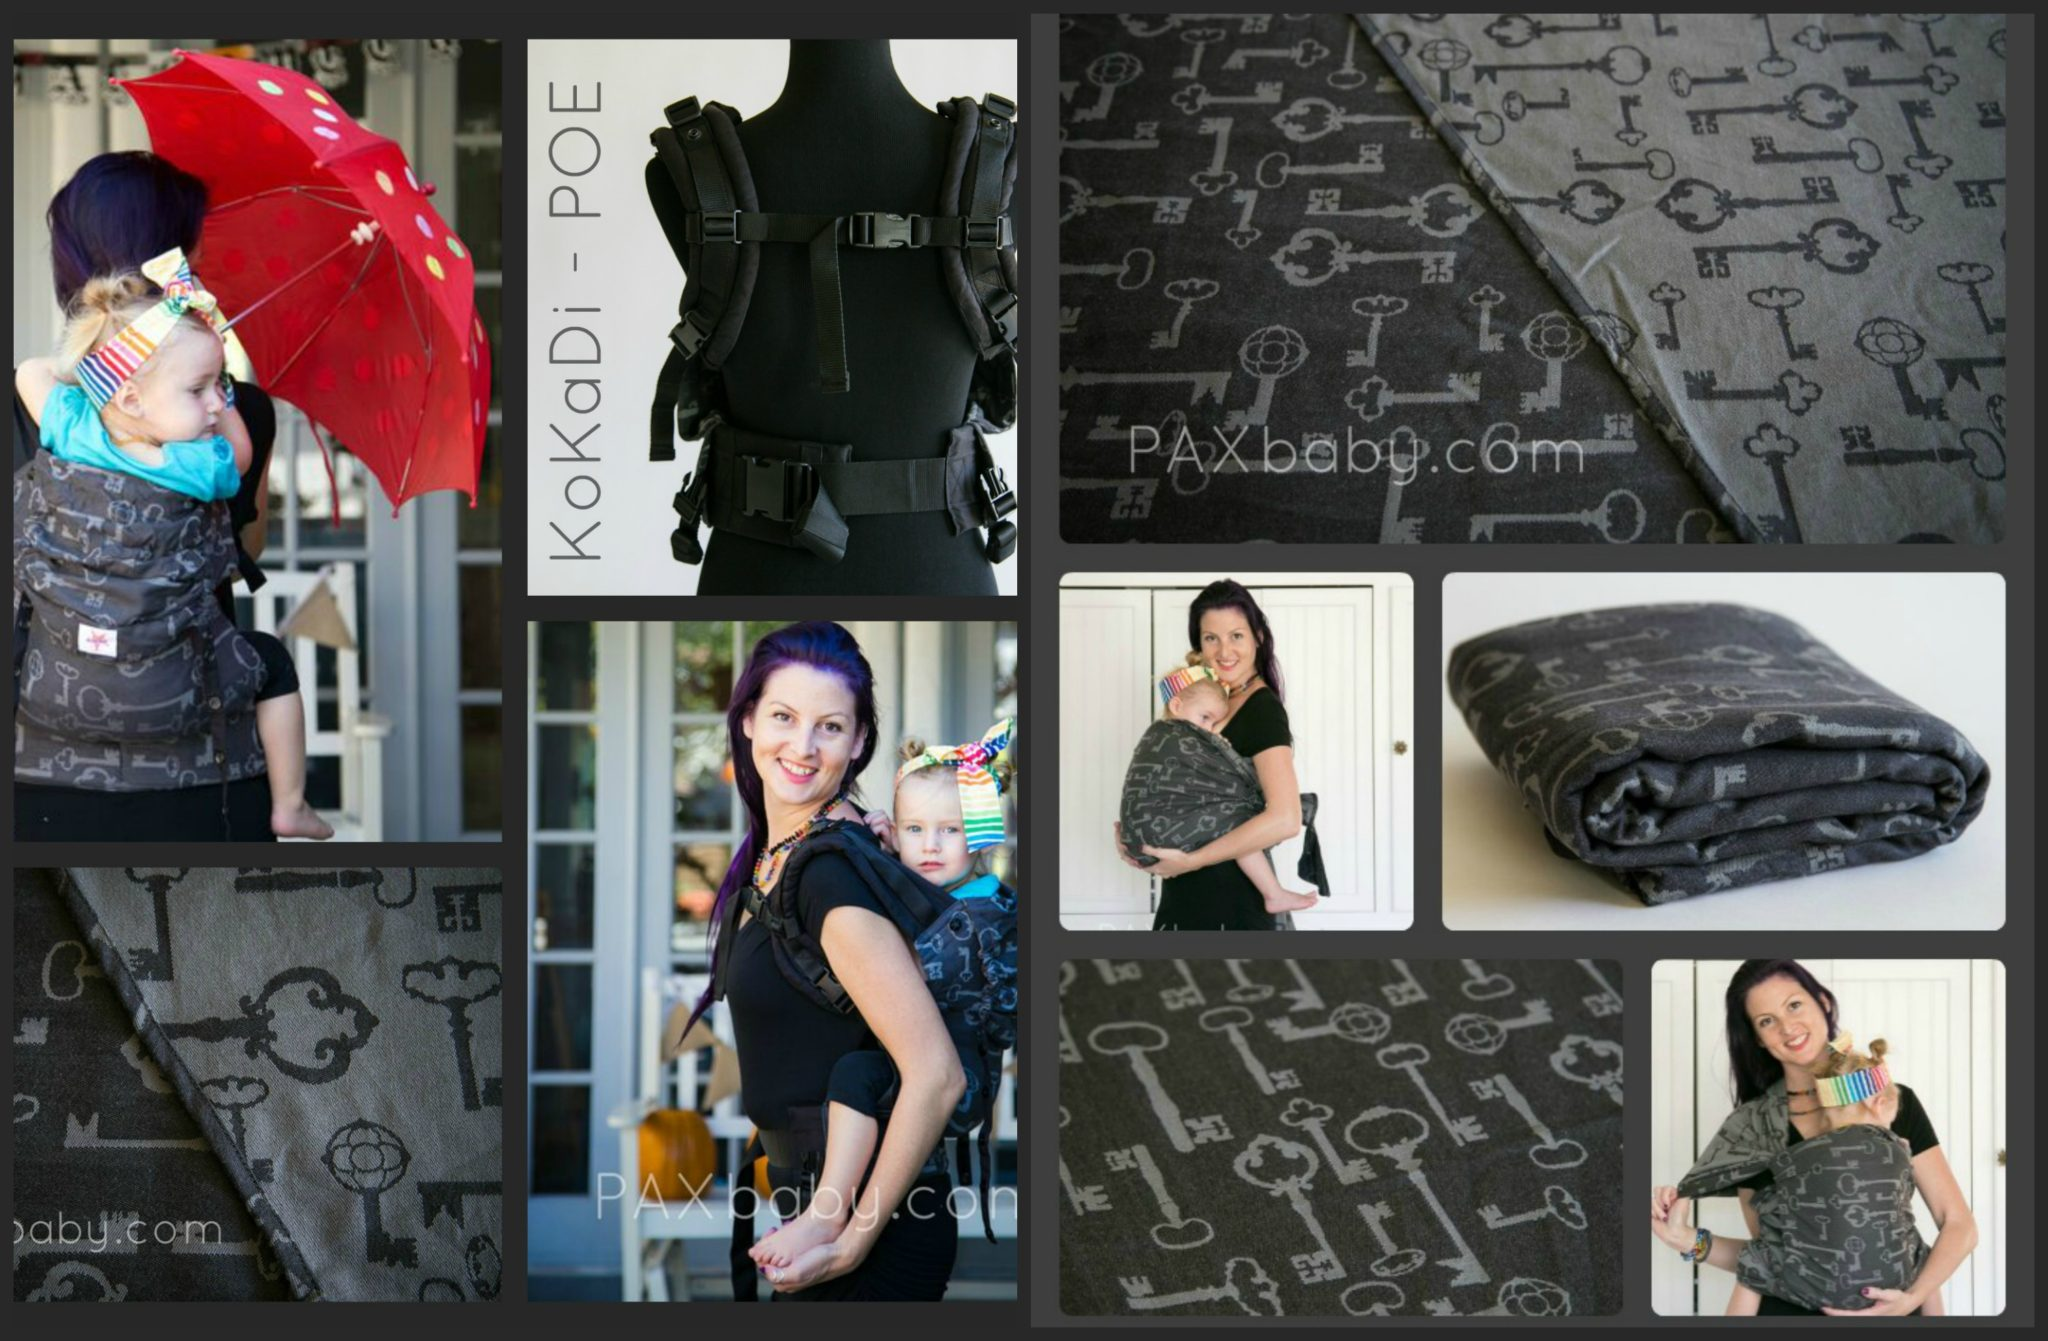 PAXbaby_Kokadi_KKD_Poe_KKDflip_wrap_woven wrap_babywearing_keys_collage